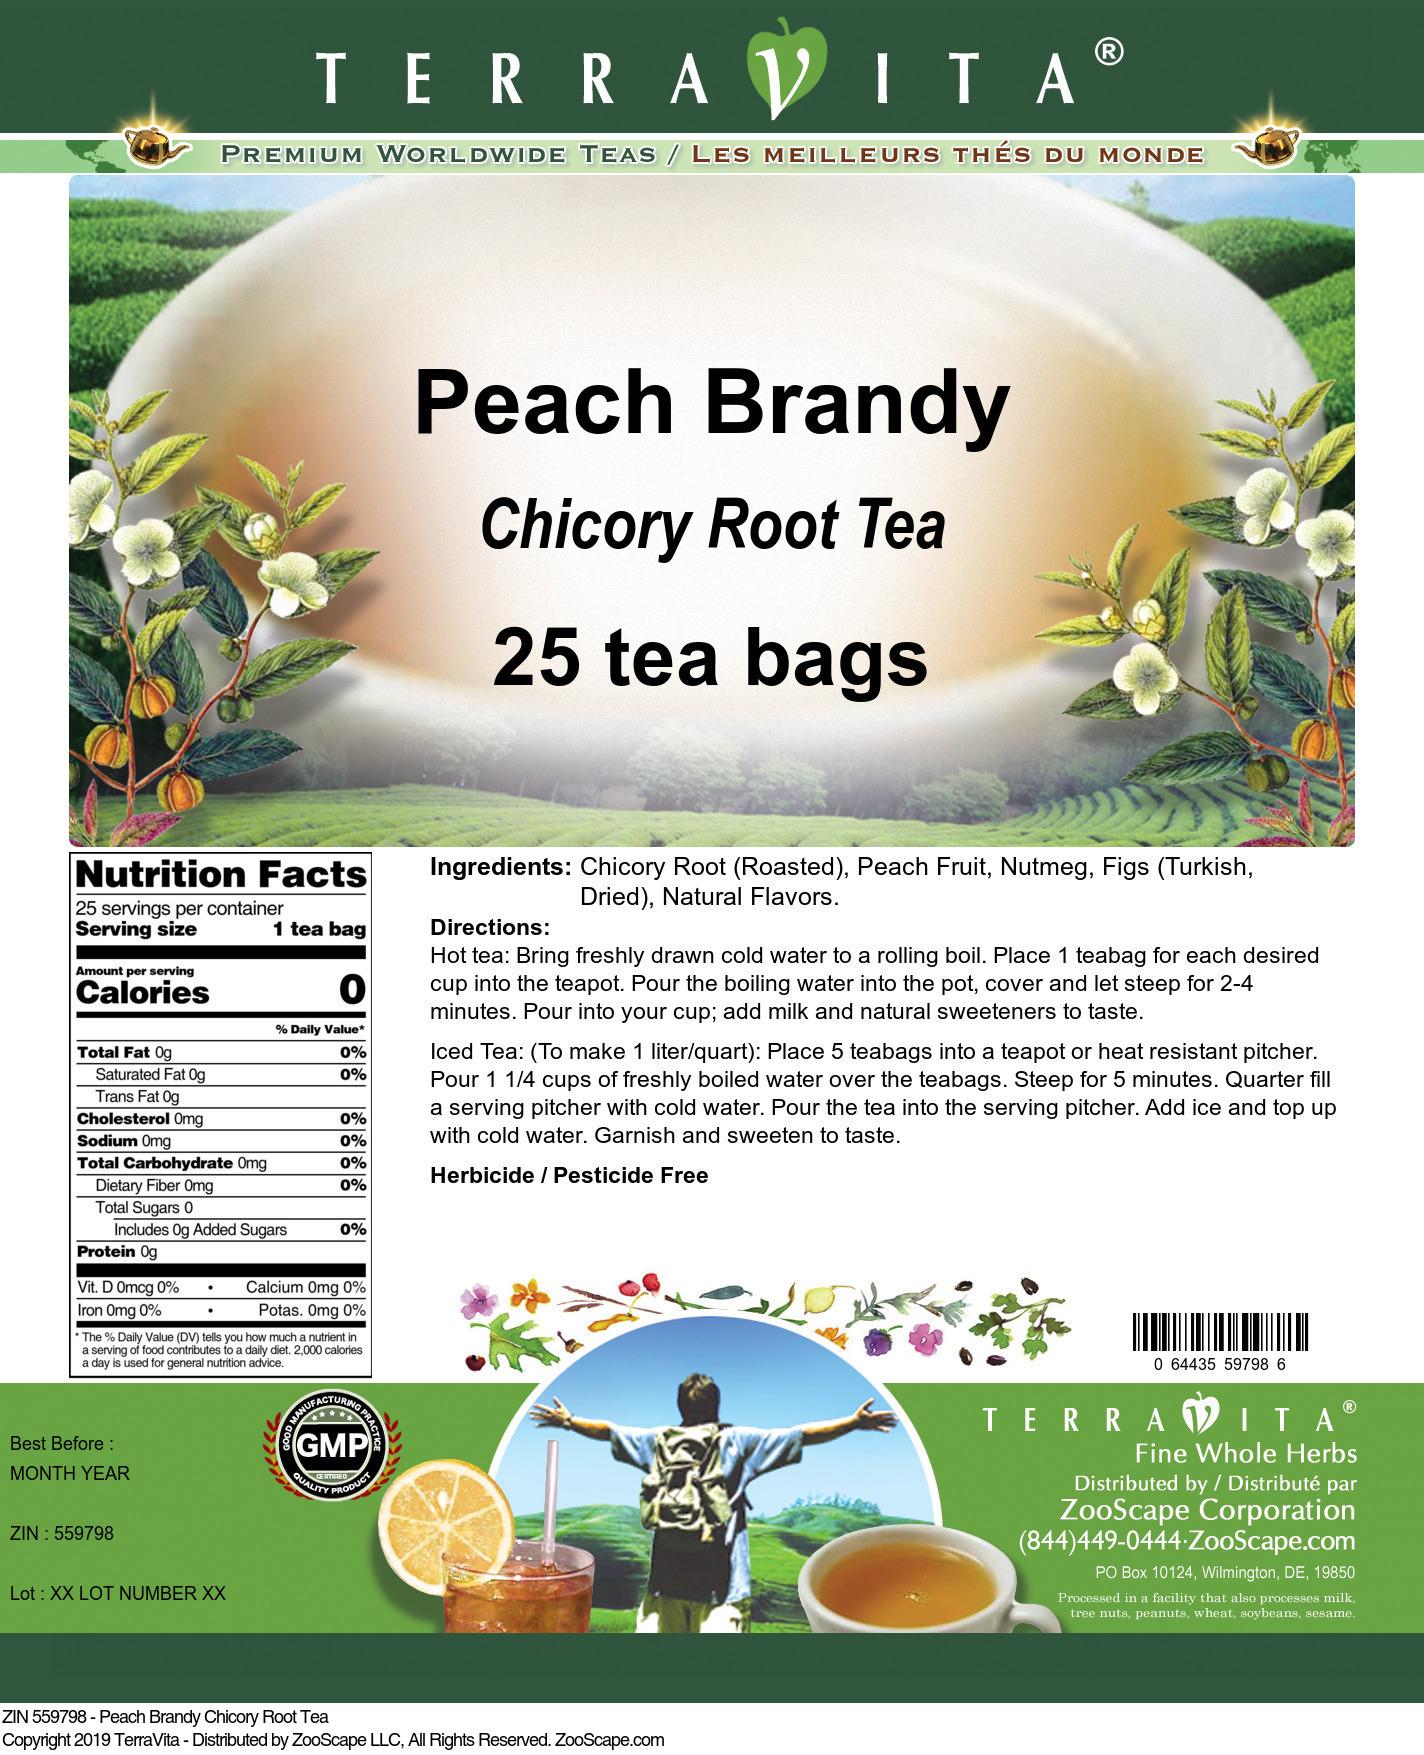 Peach Brandy Chicory Root Tea